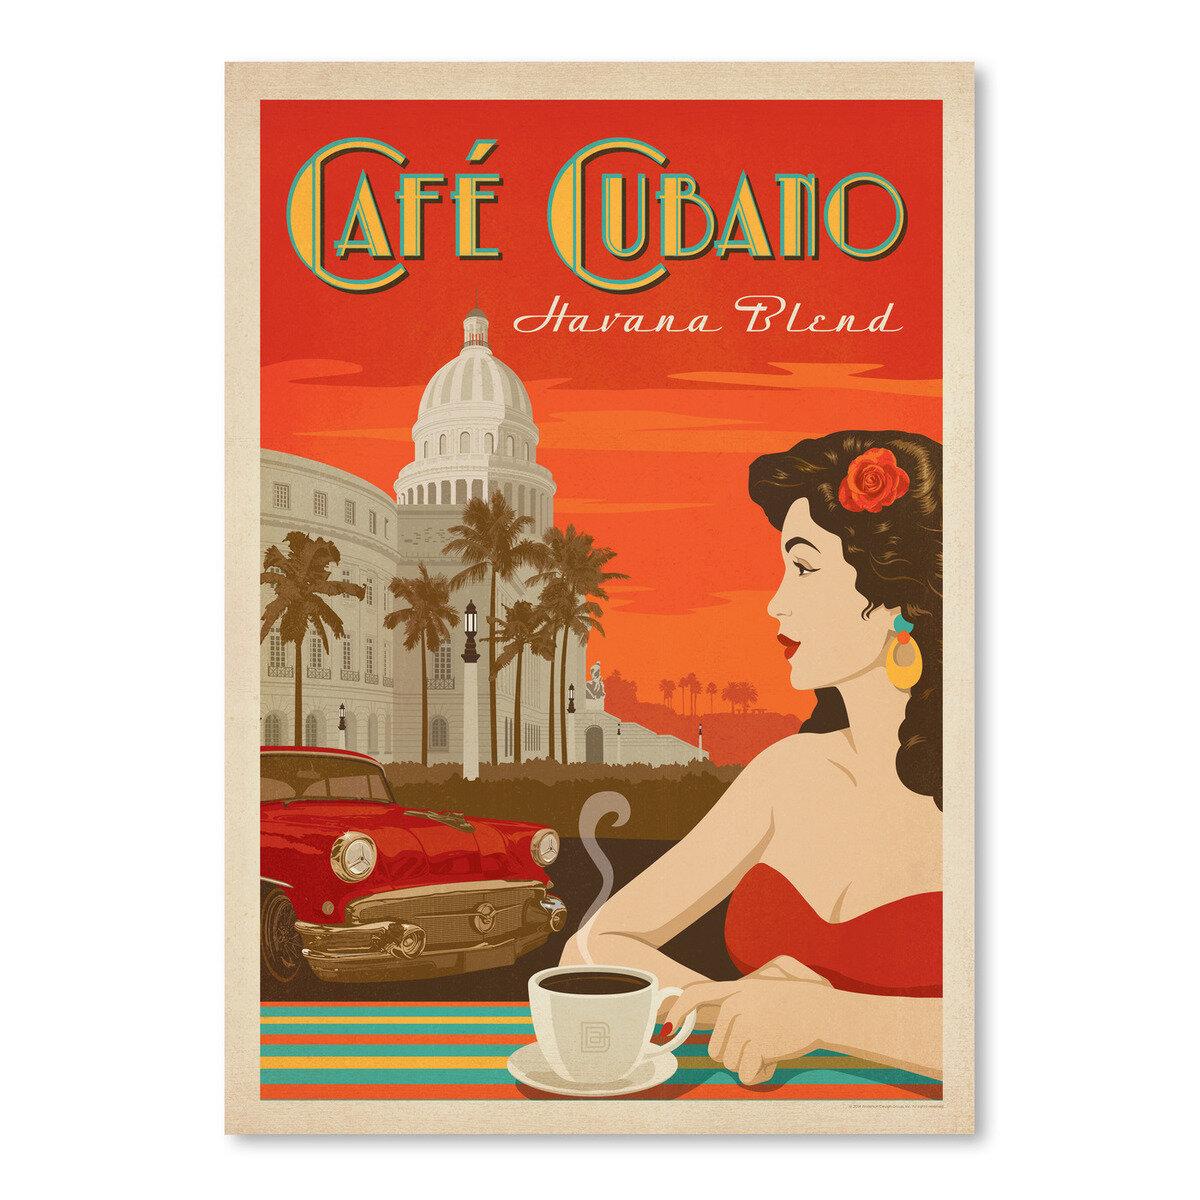 "/""Cafe Cubano/"" Havana Blend Coffee Kitchen Vintage Art Poster TIN SIGN"